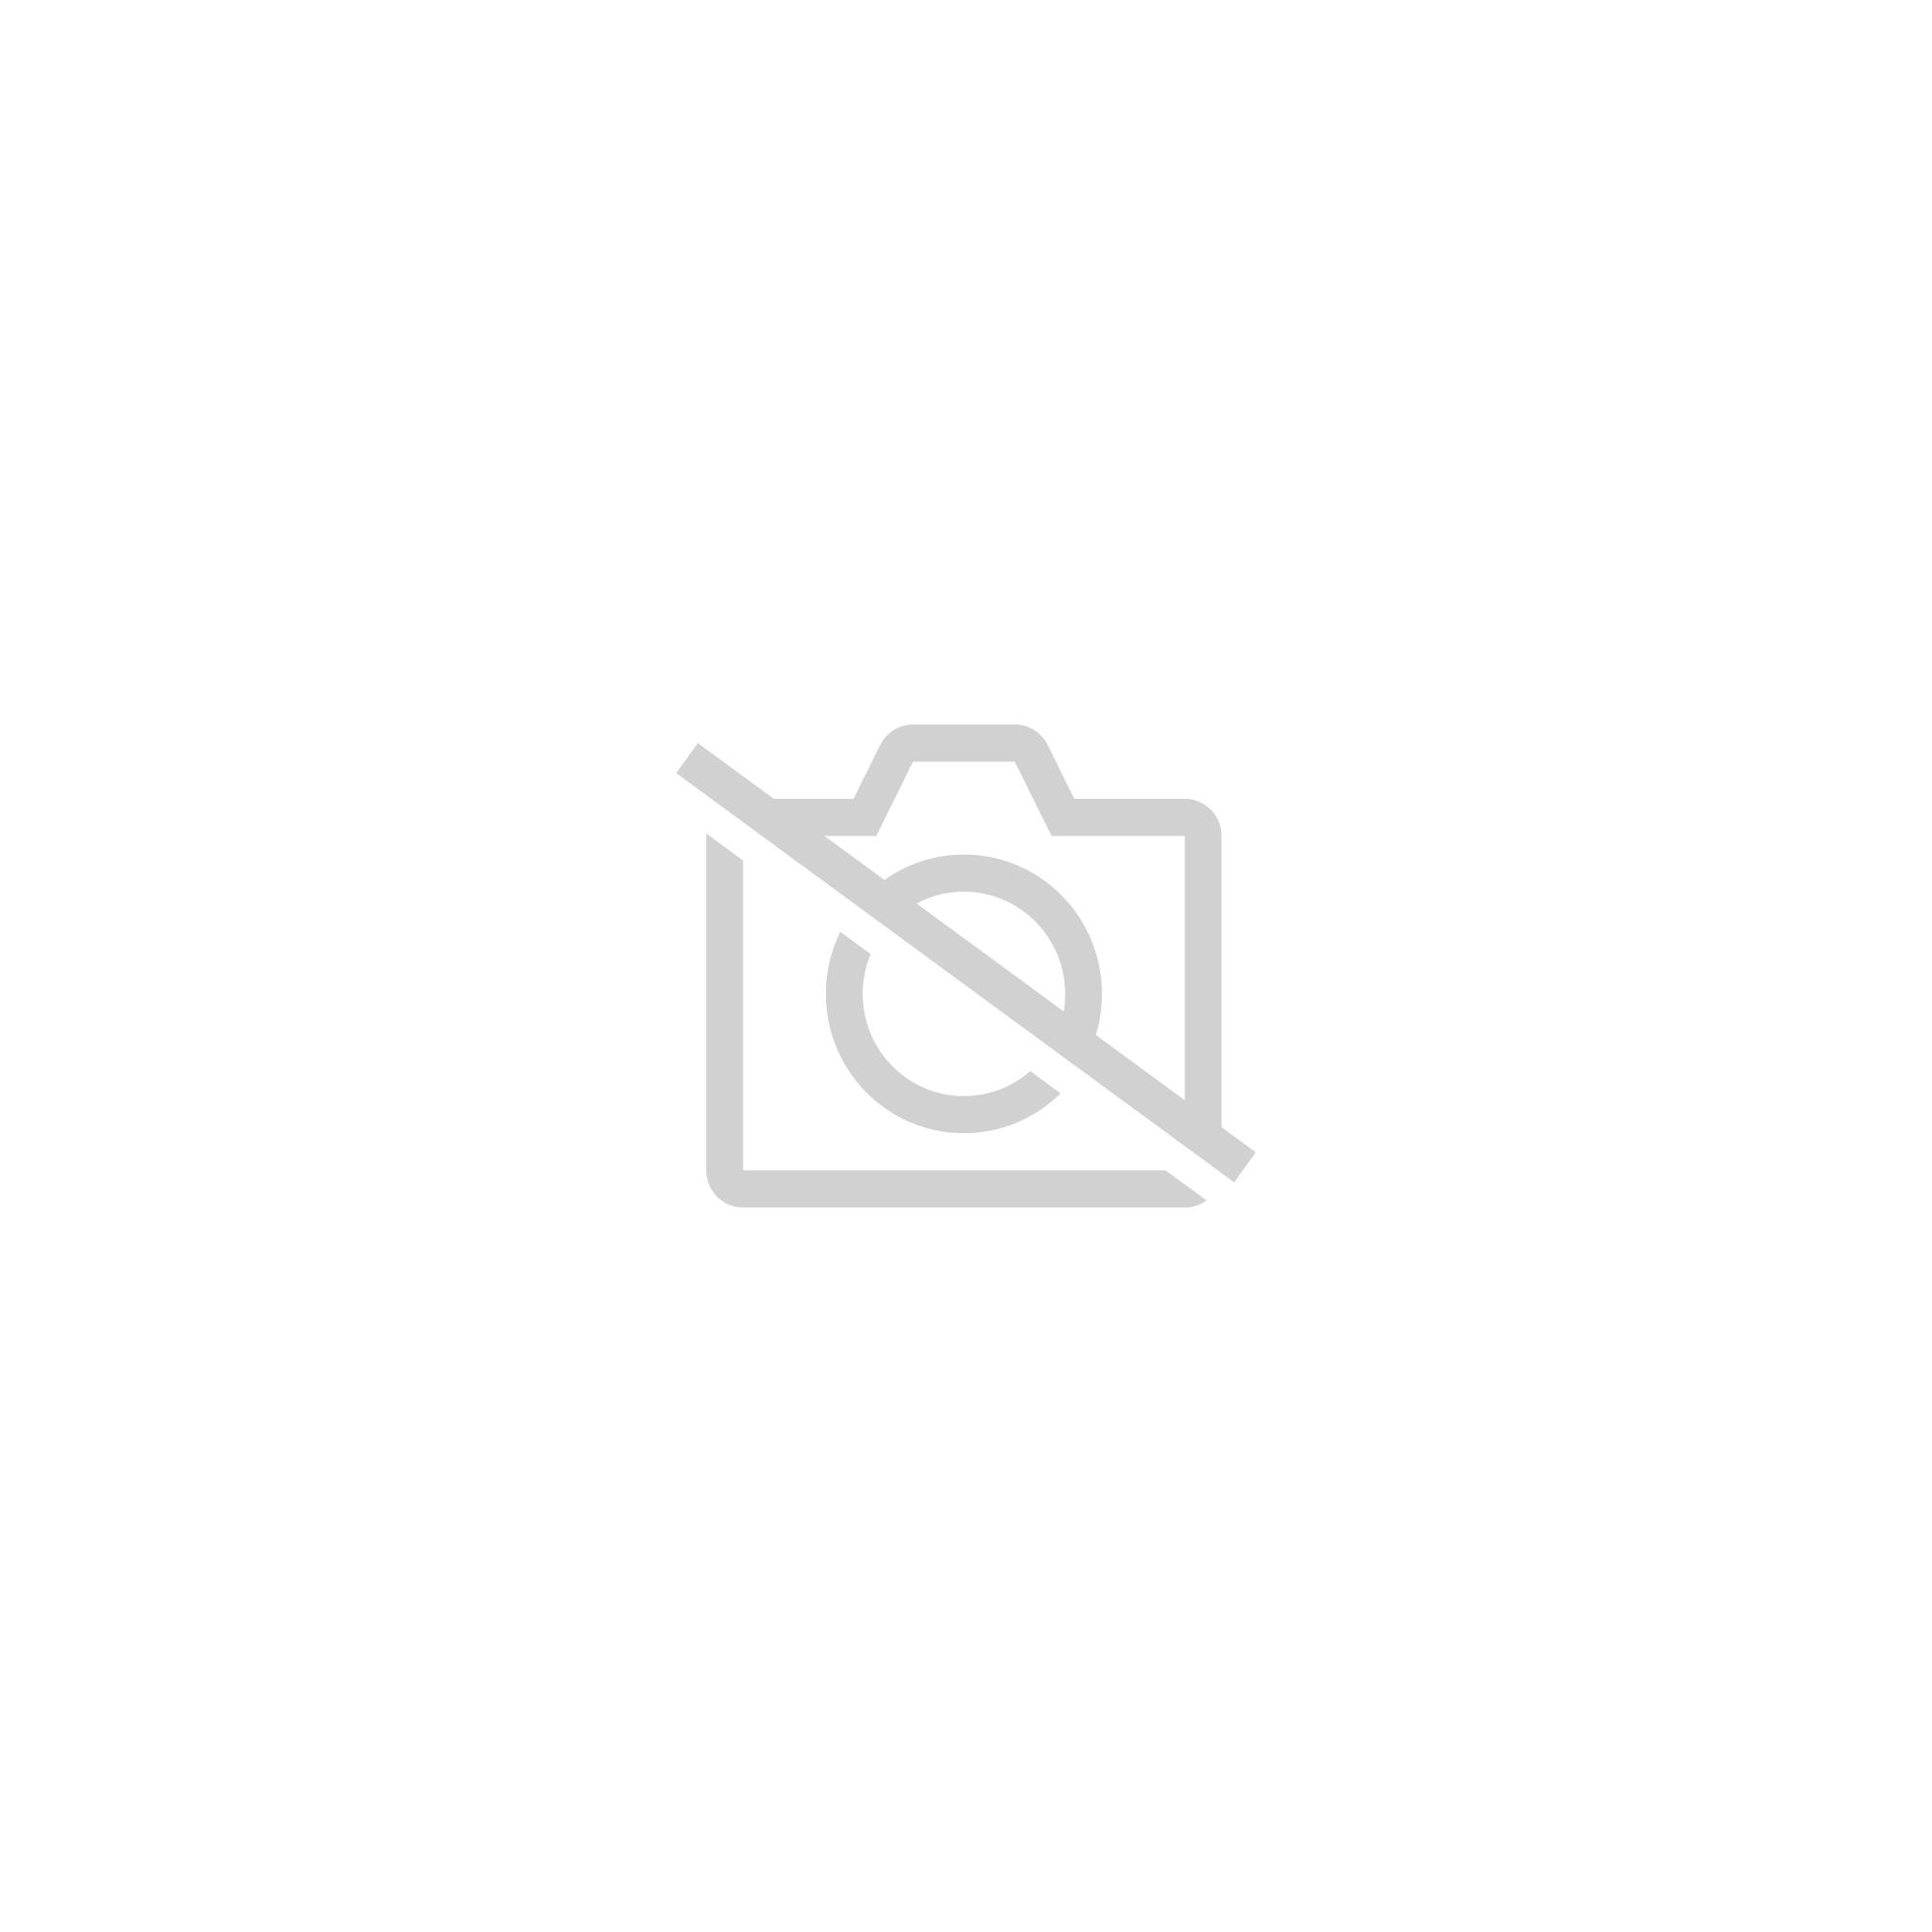 Maison Valise Polly Pocket Transportable